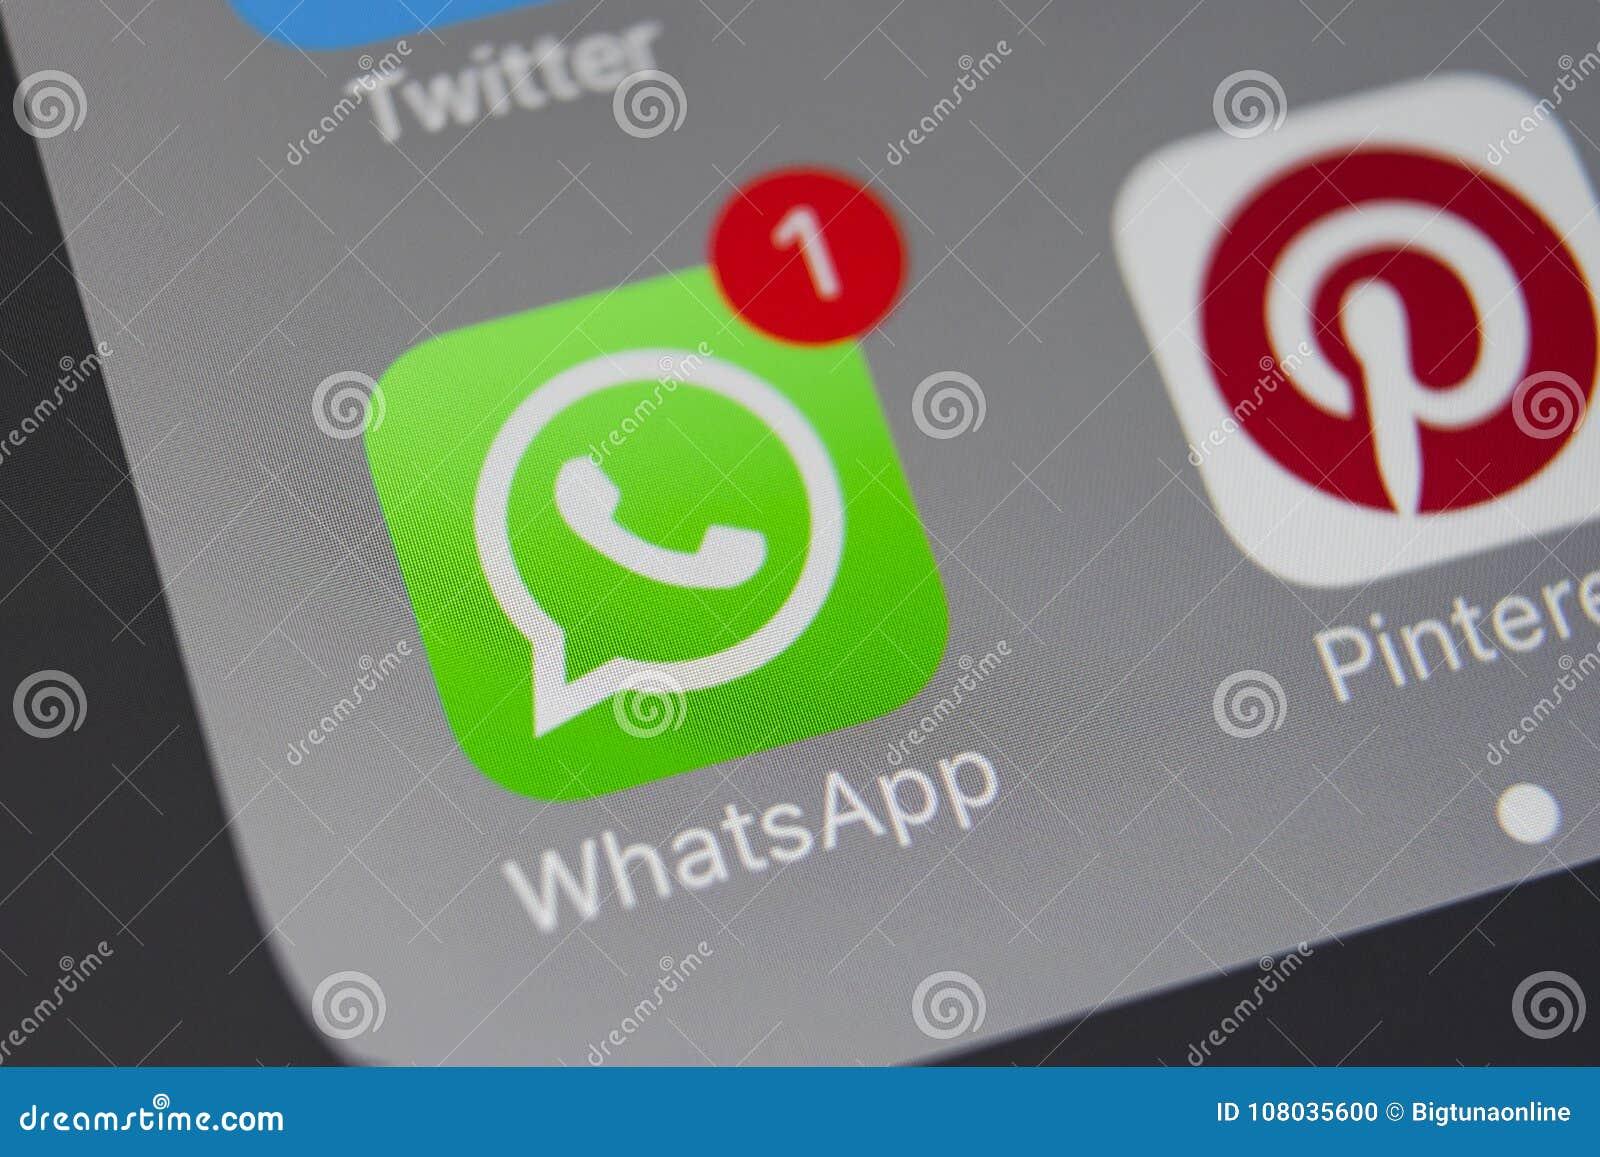 Whatsapp Russland